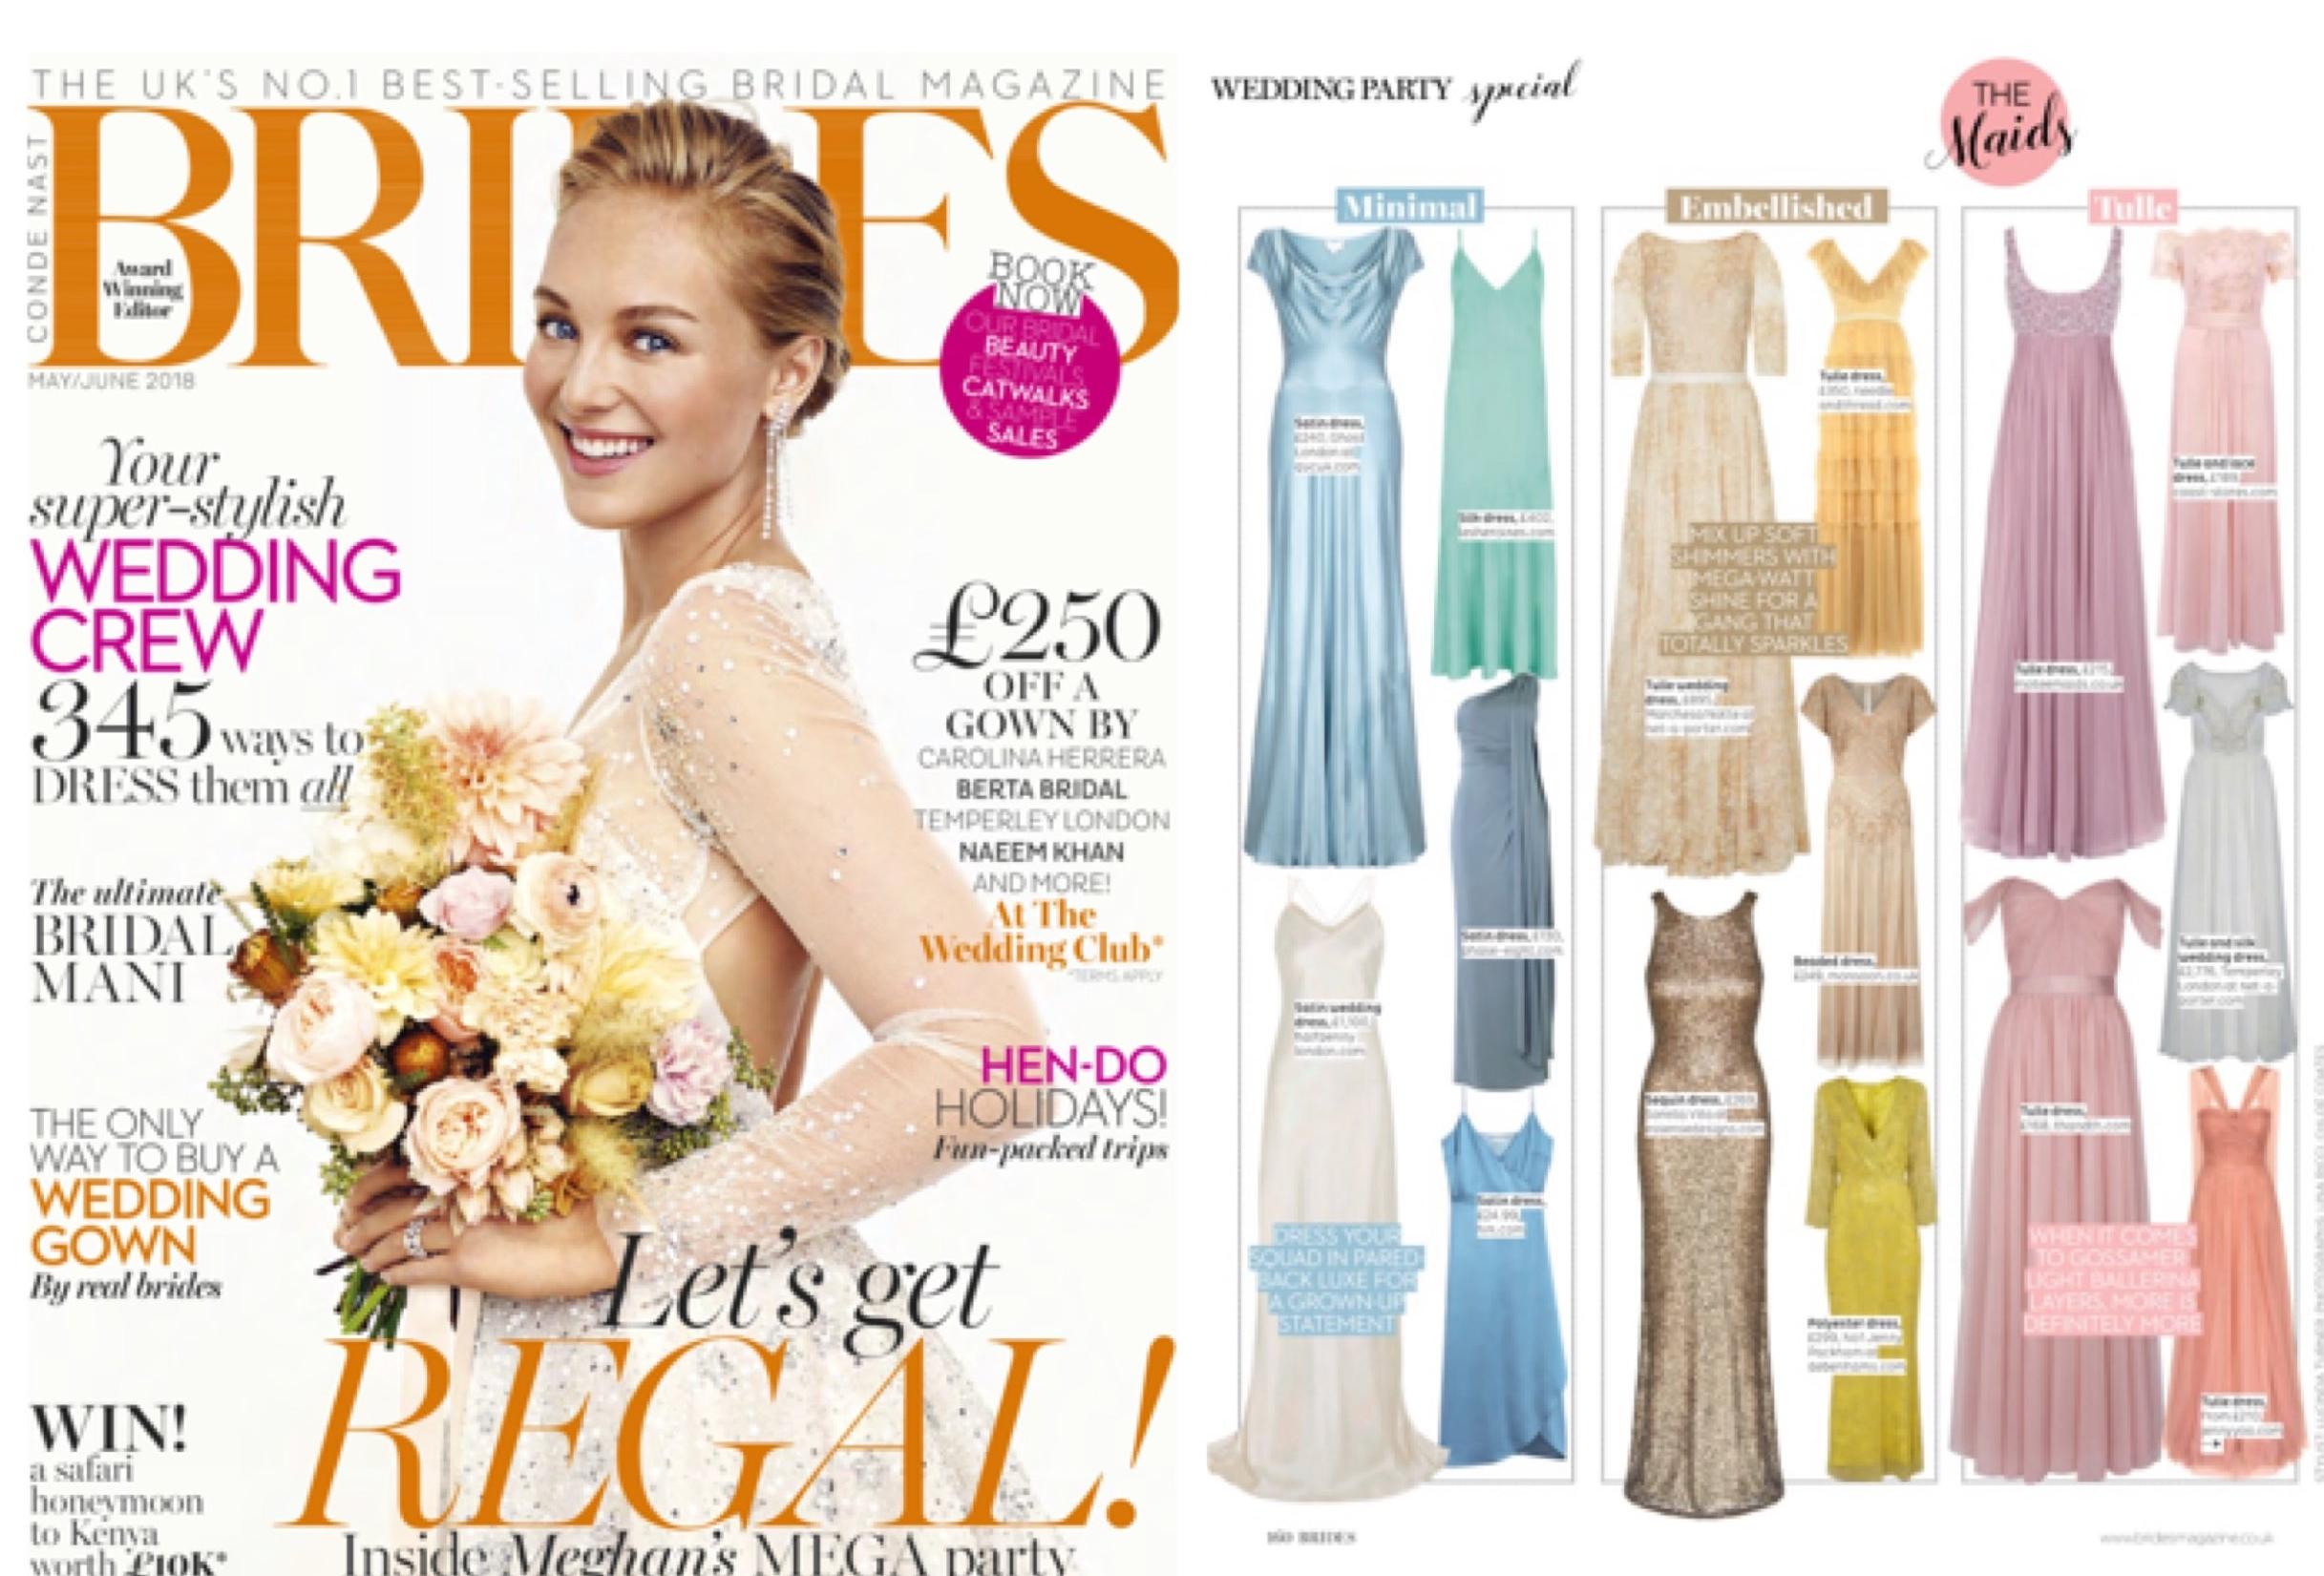 Brides Magazine - May/June 2018